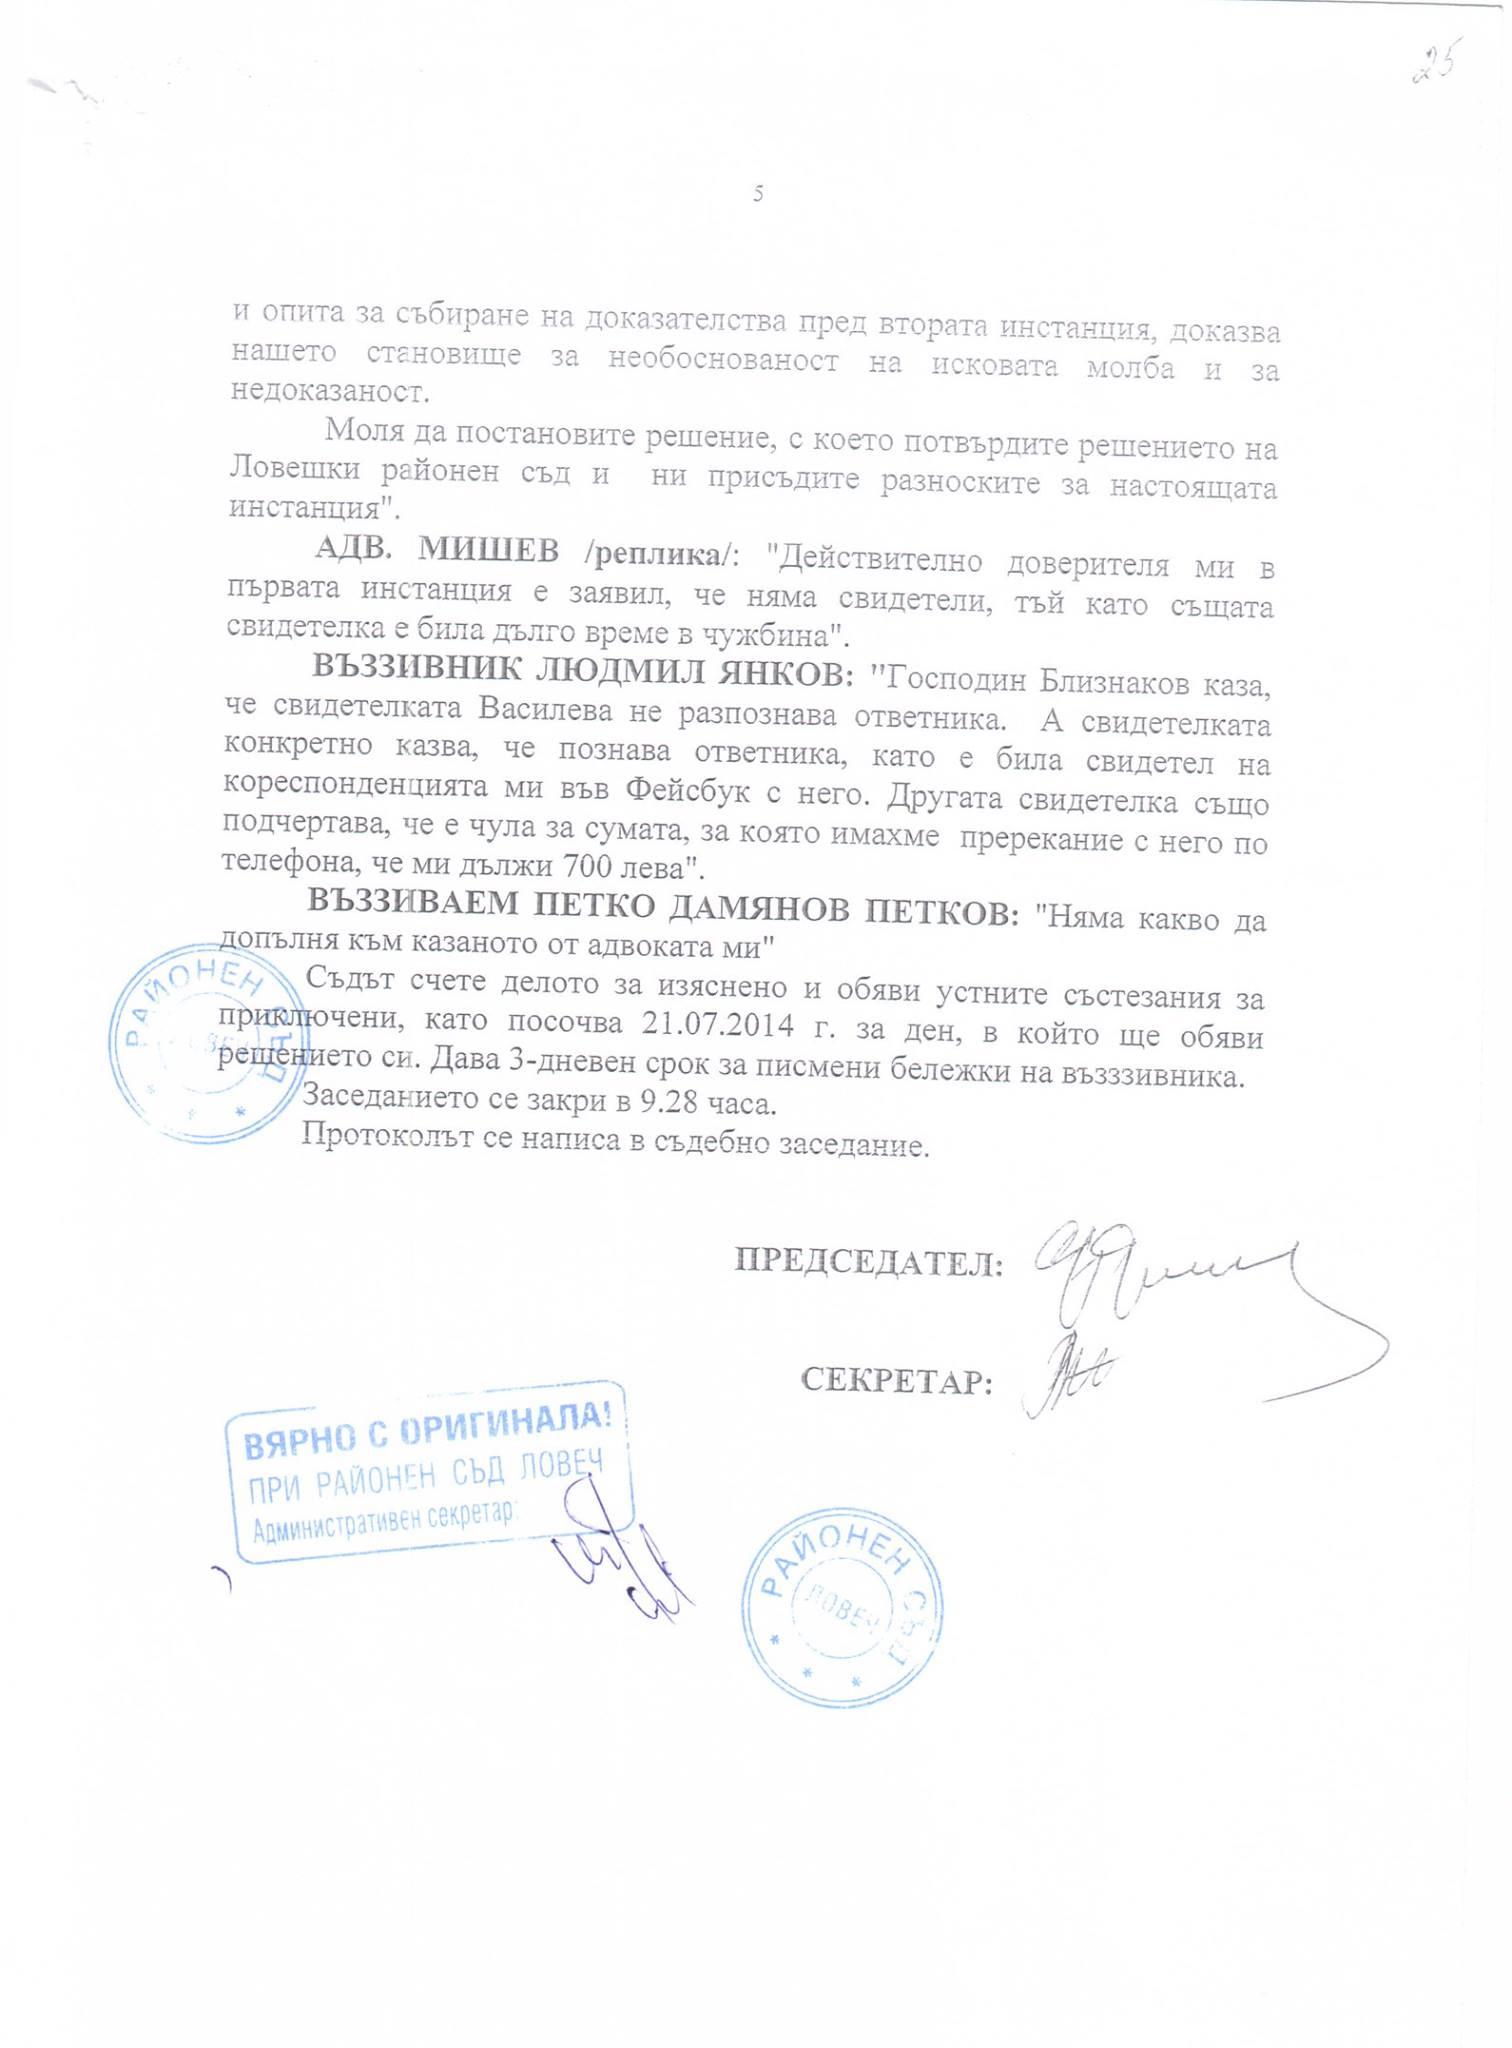 protokol-petkov-5